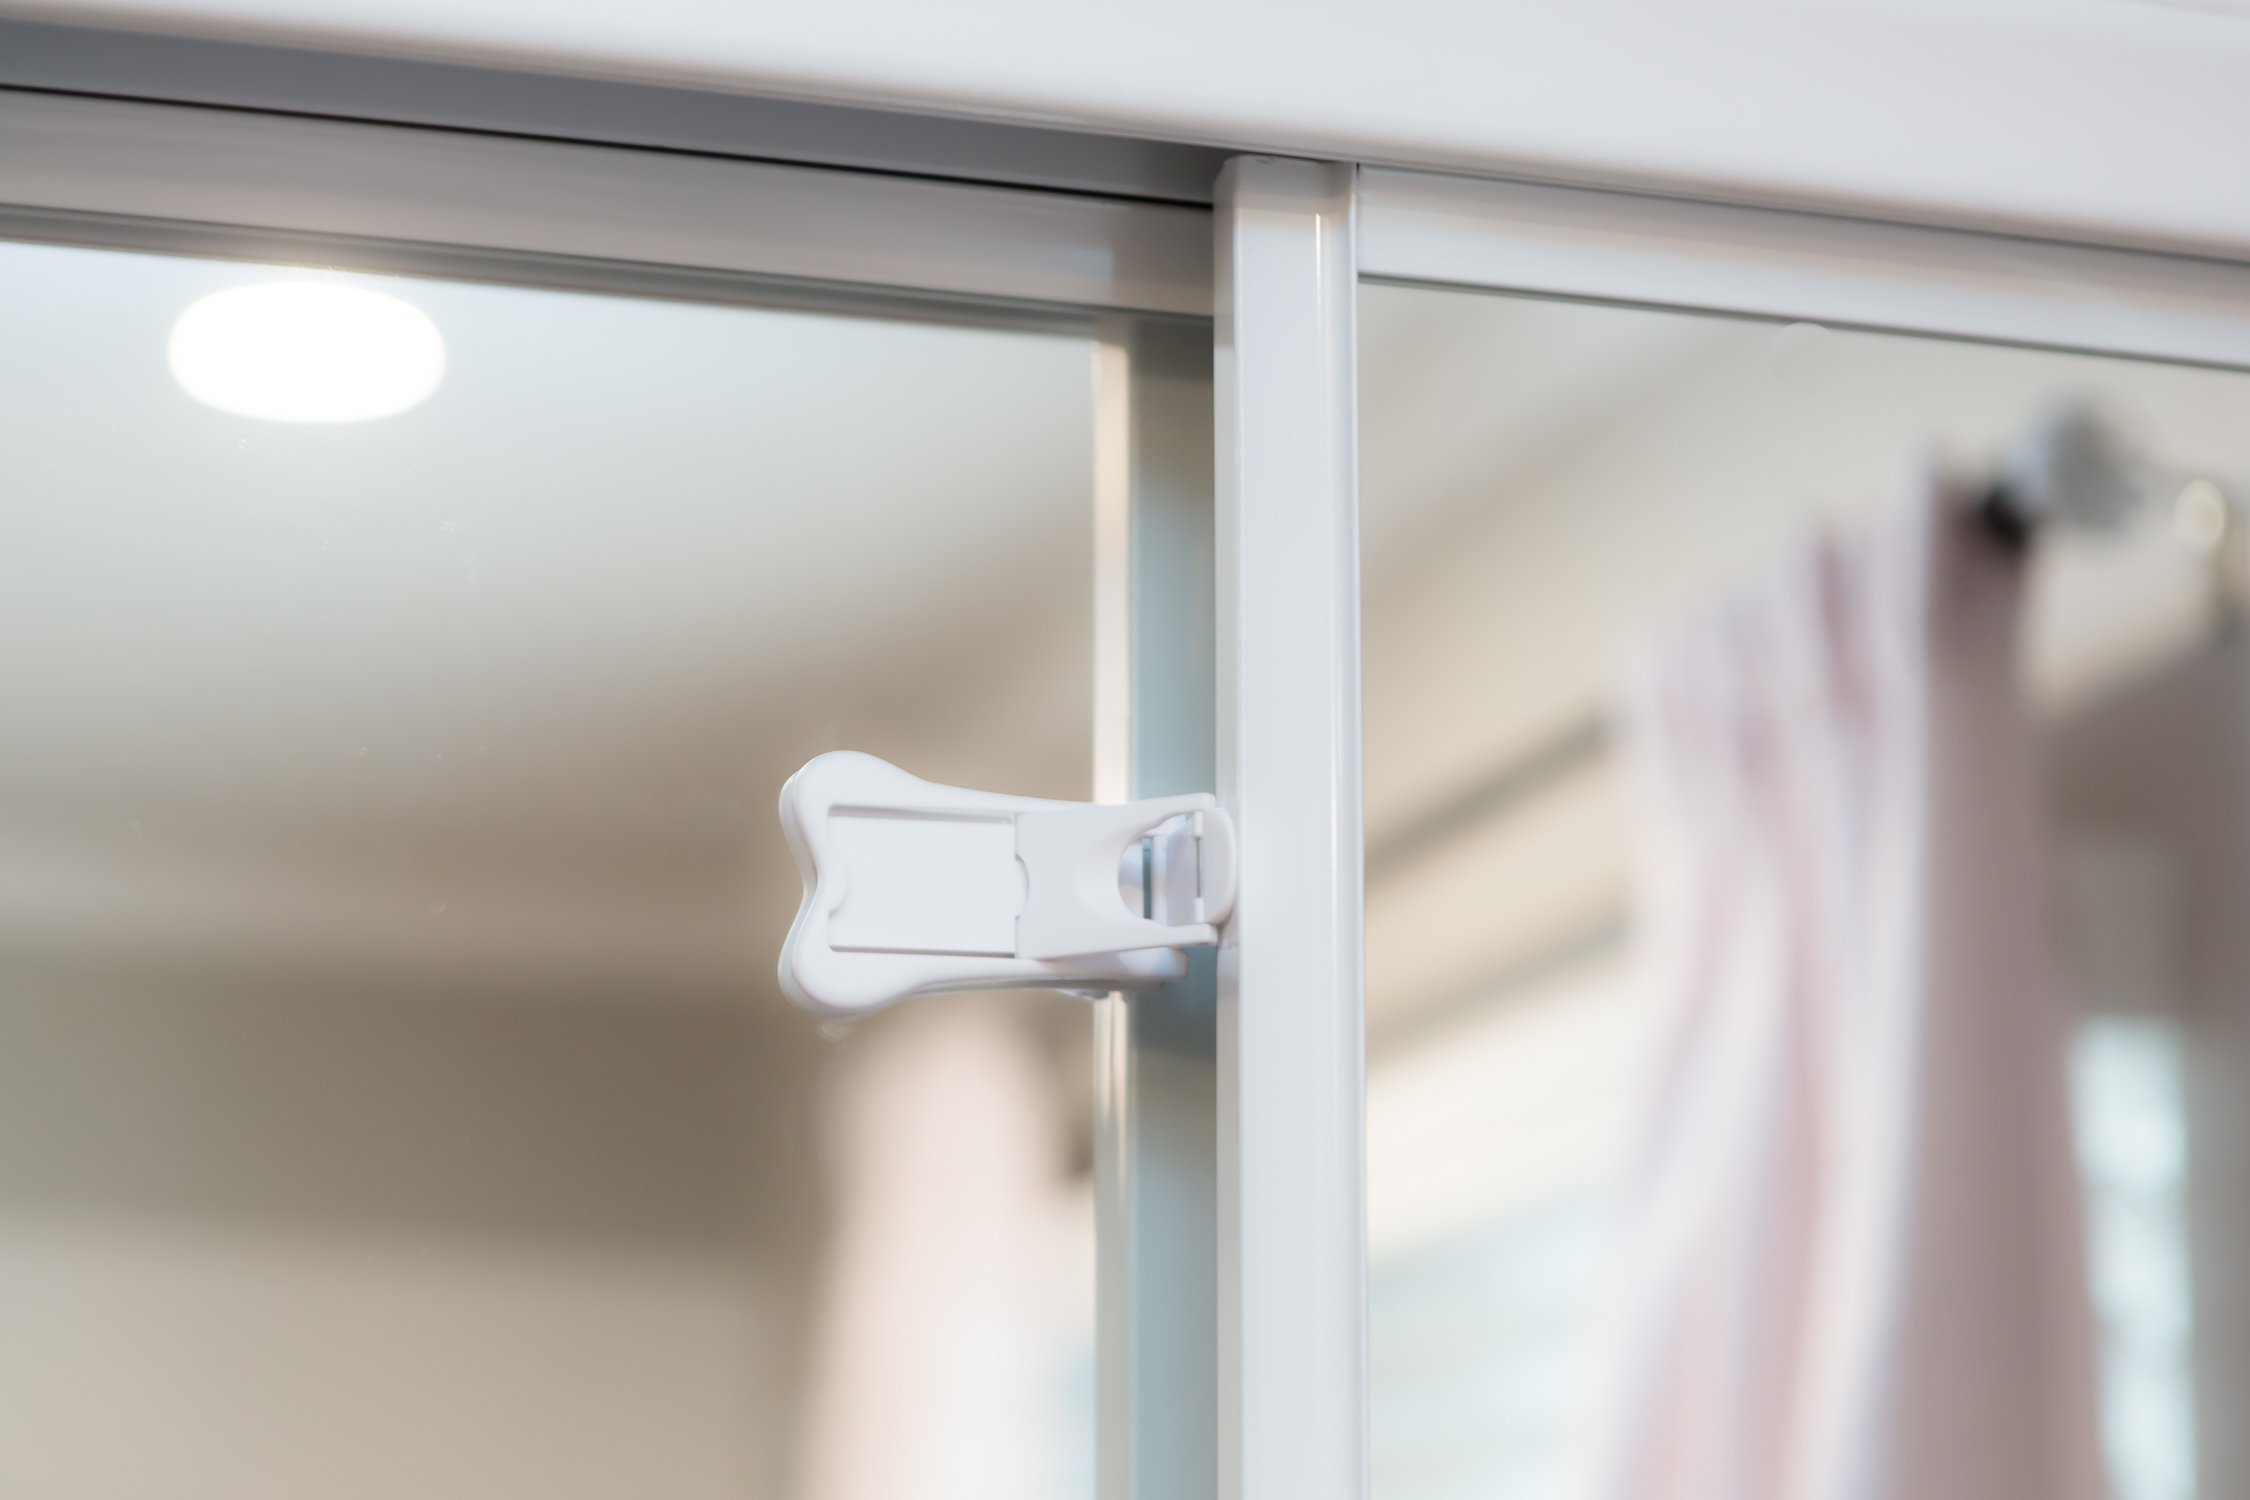 Cheap Sliding Patio Door Locks Find Sliding Patio Door Locks Deals